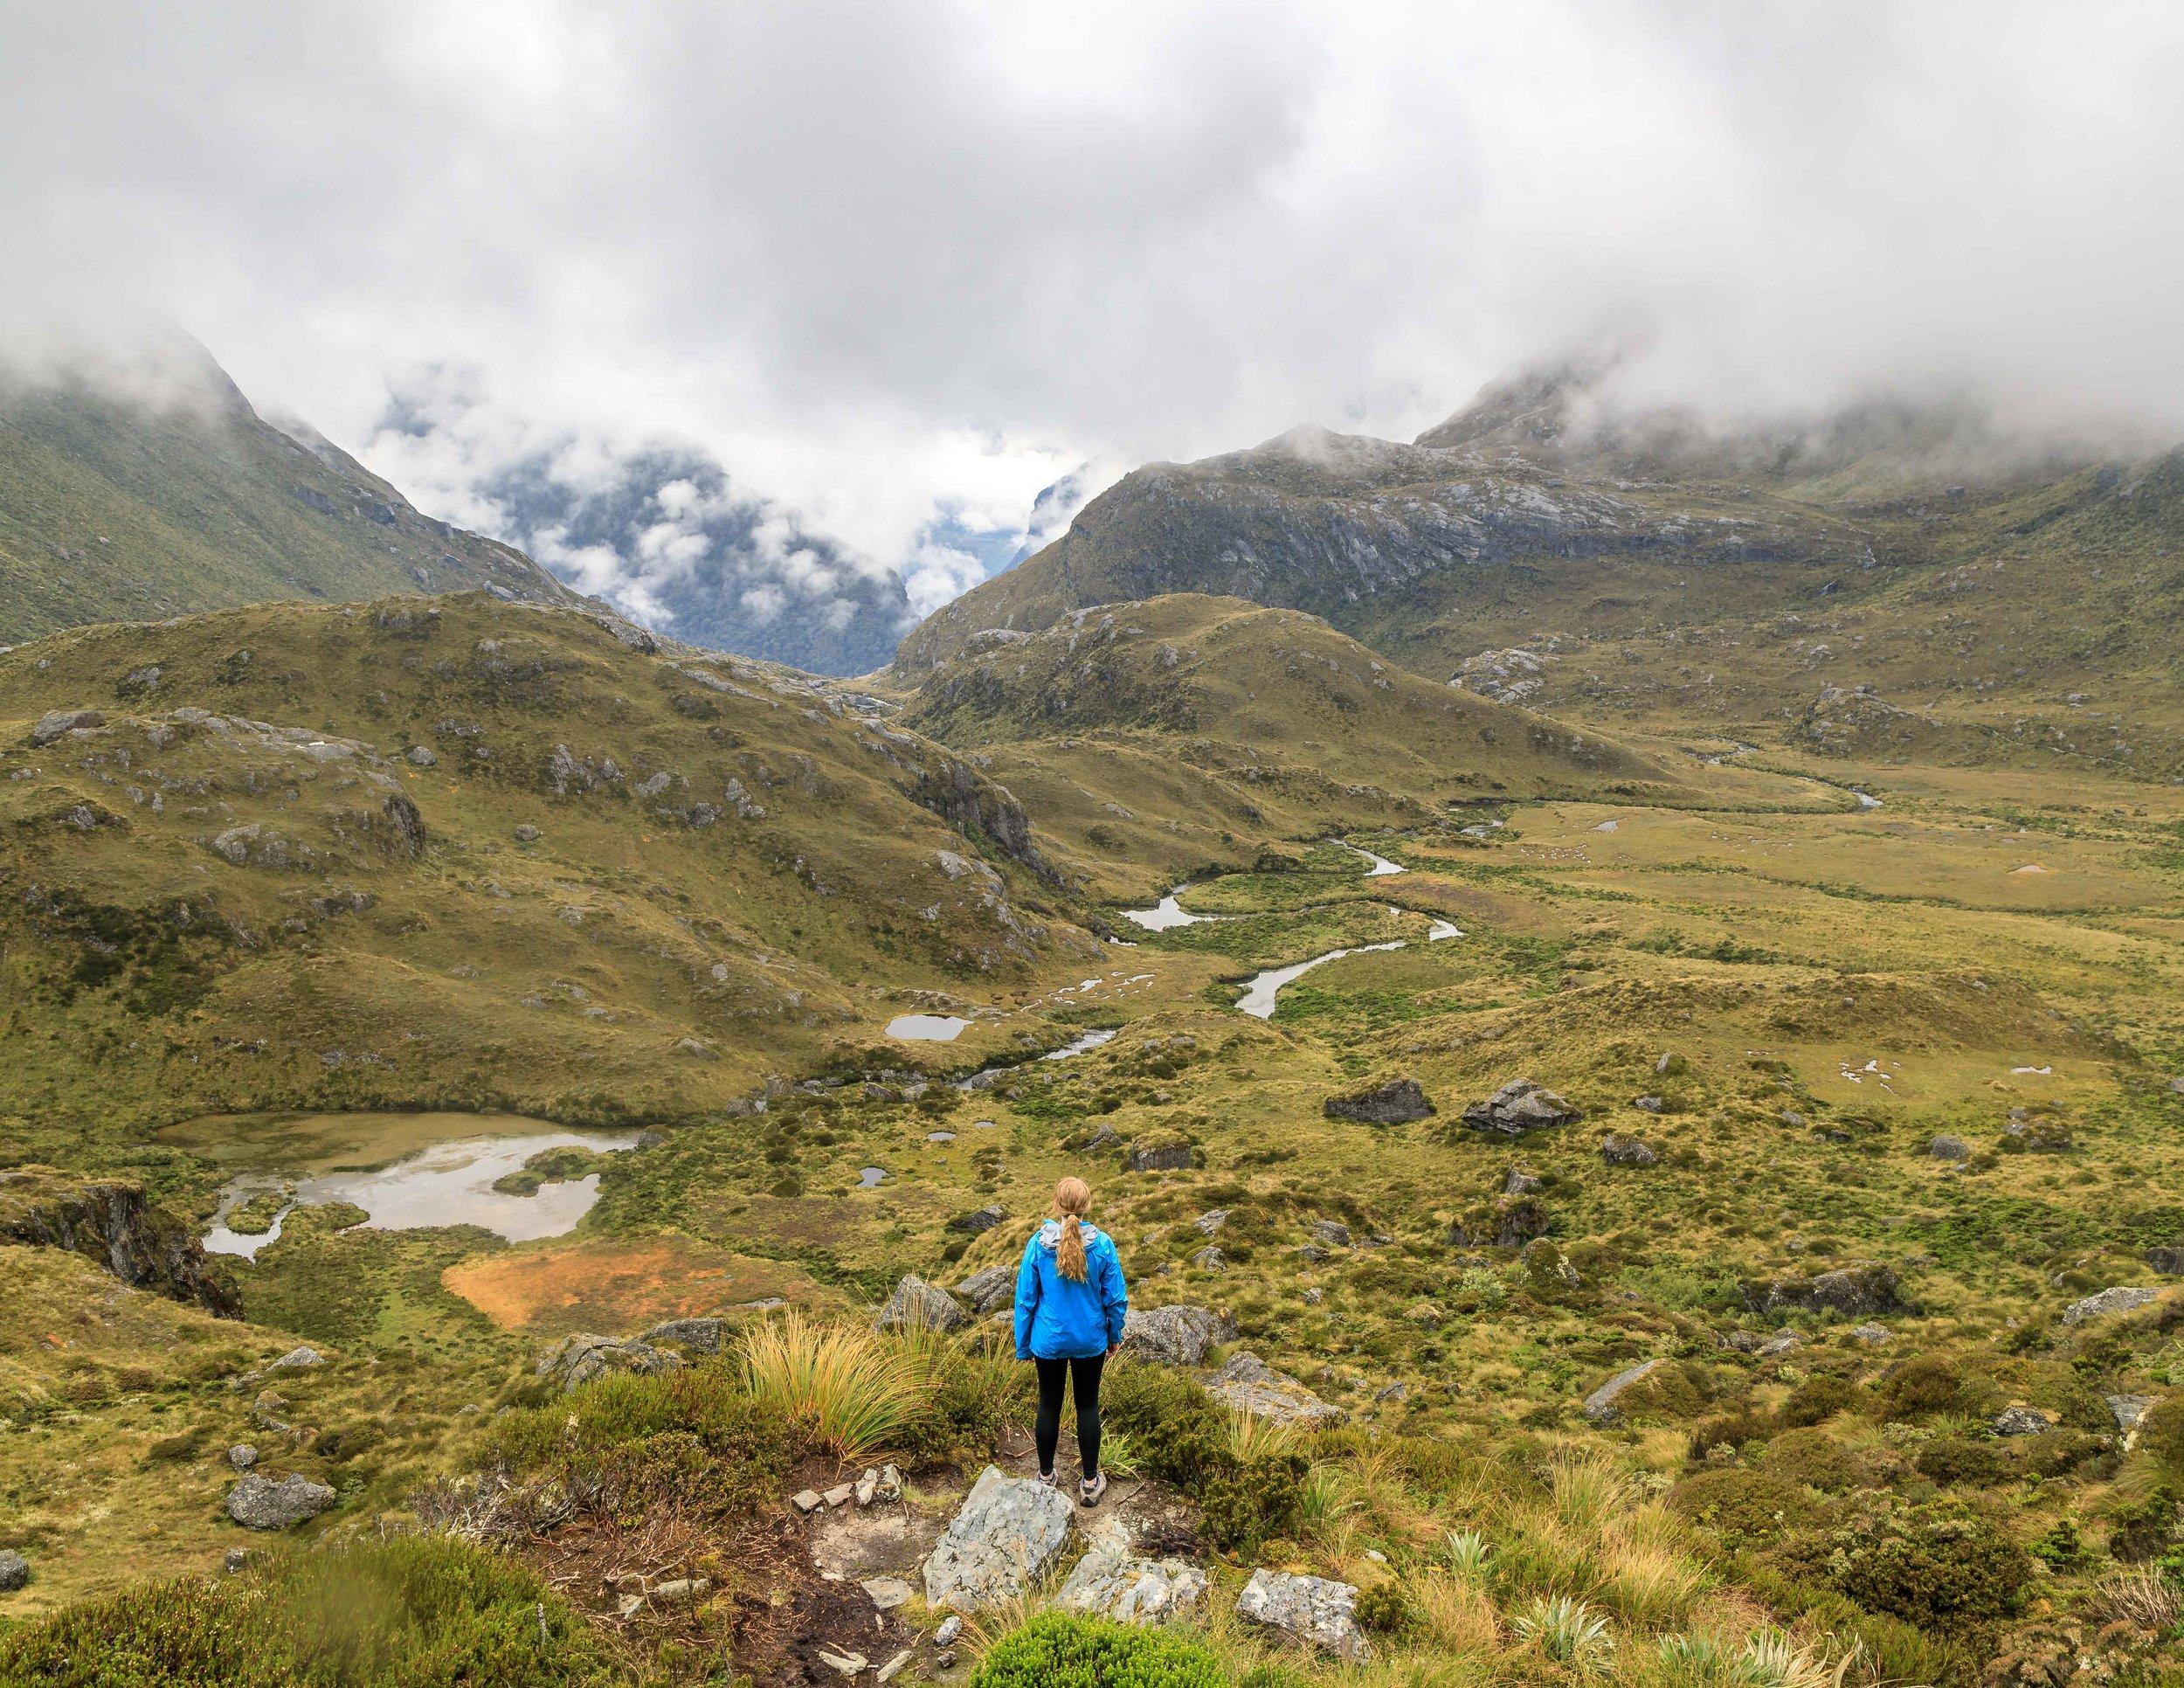 The Routeburn Track: Hiking up to Harris Saddle